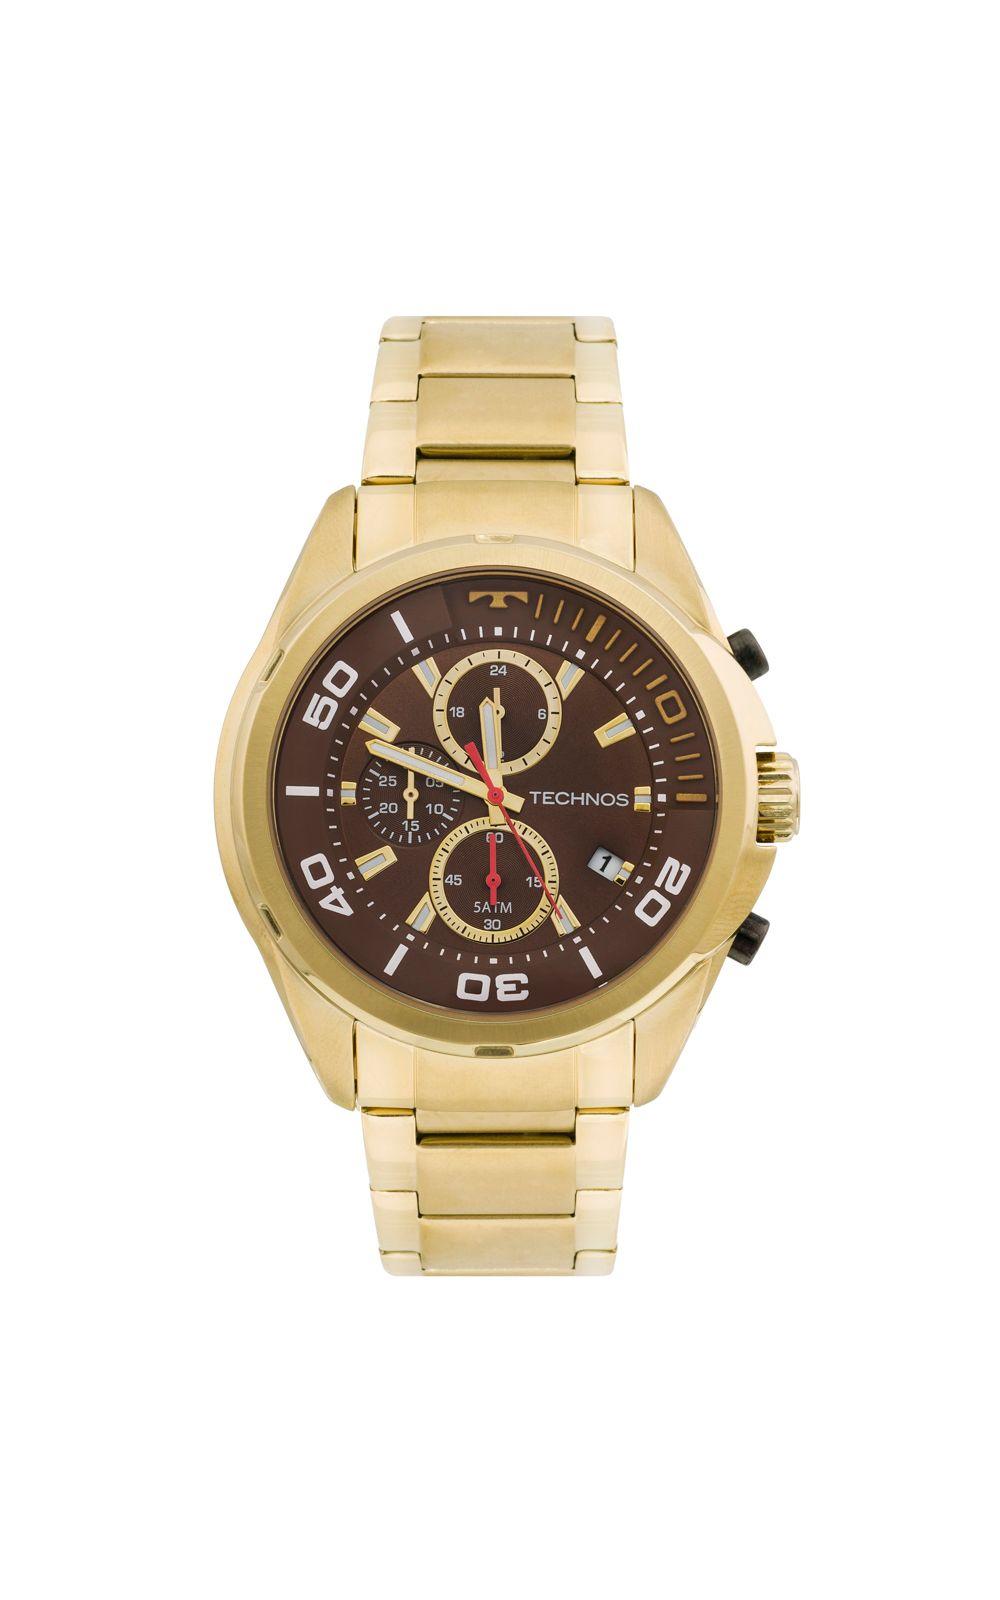 59bf1d2f429 Relógio Technos Skymaster JS15BI 4M Dourado. undefined